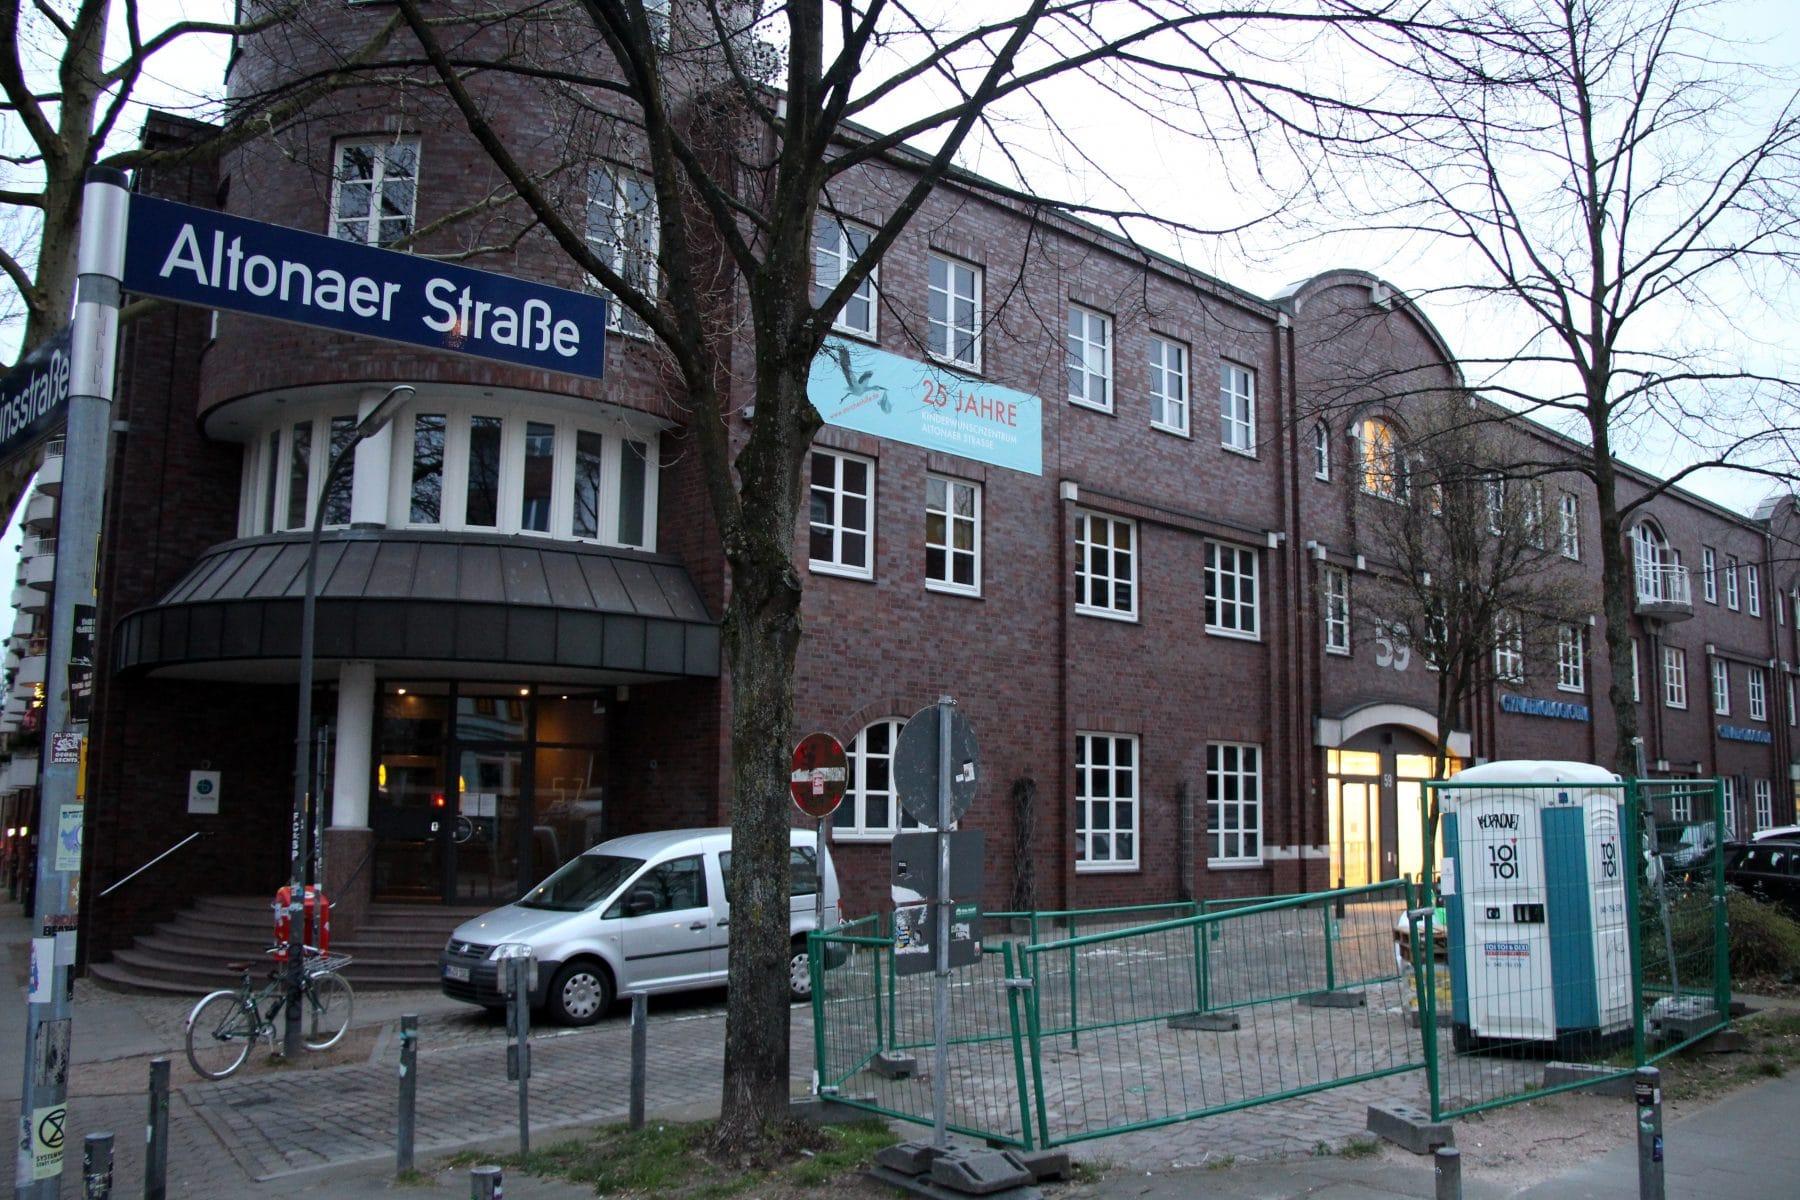 Kinderwunschklinik Altonaer Strasse